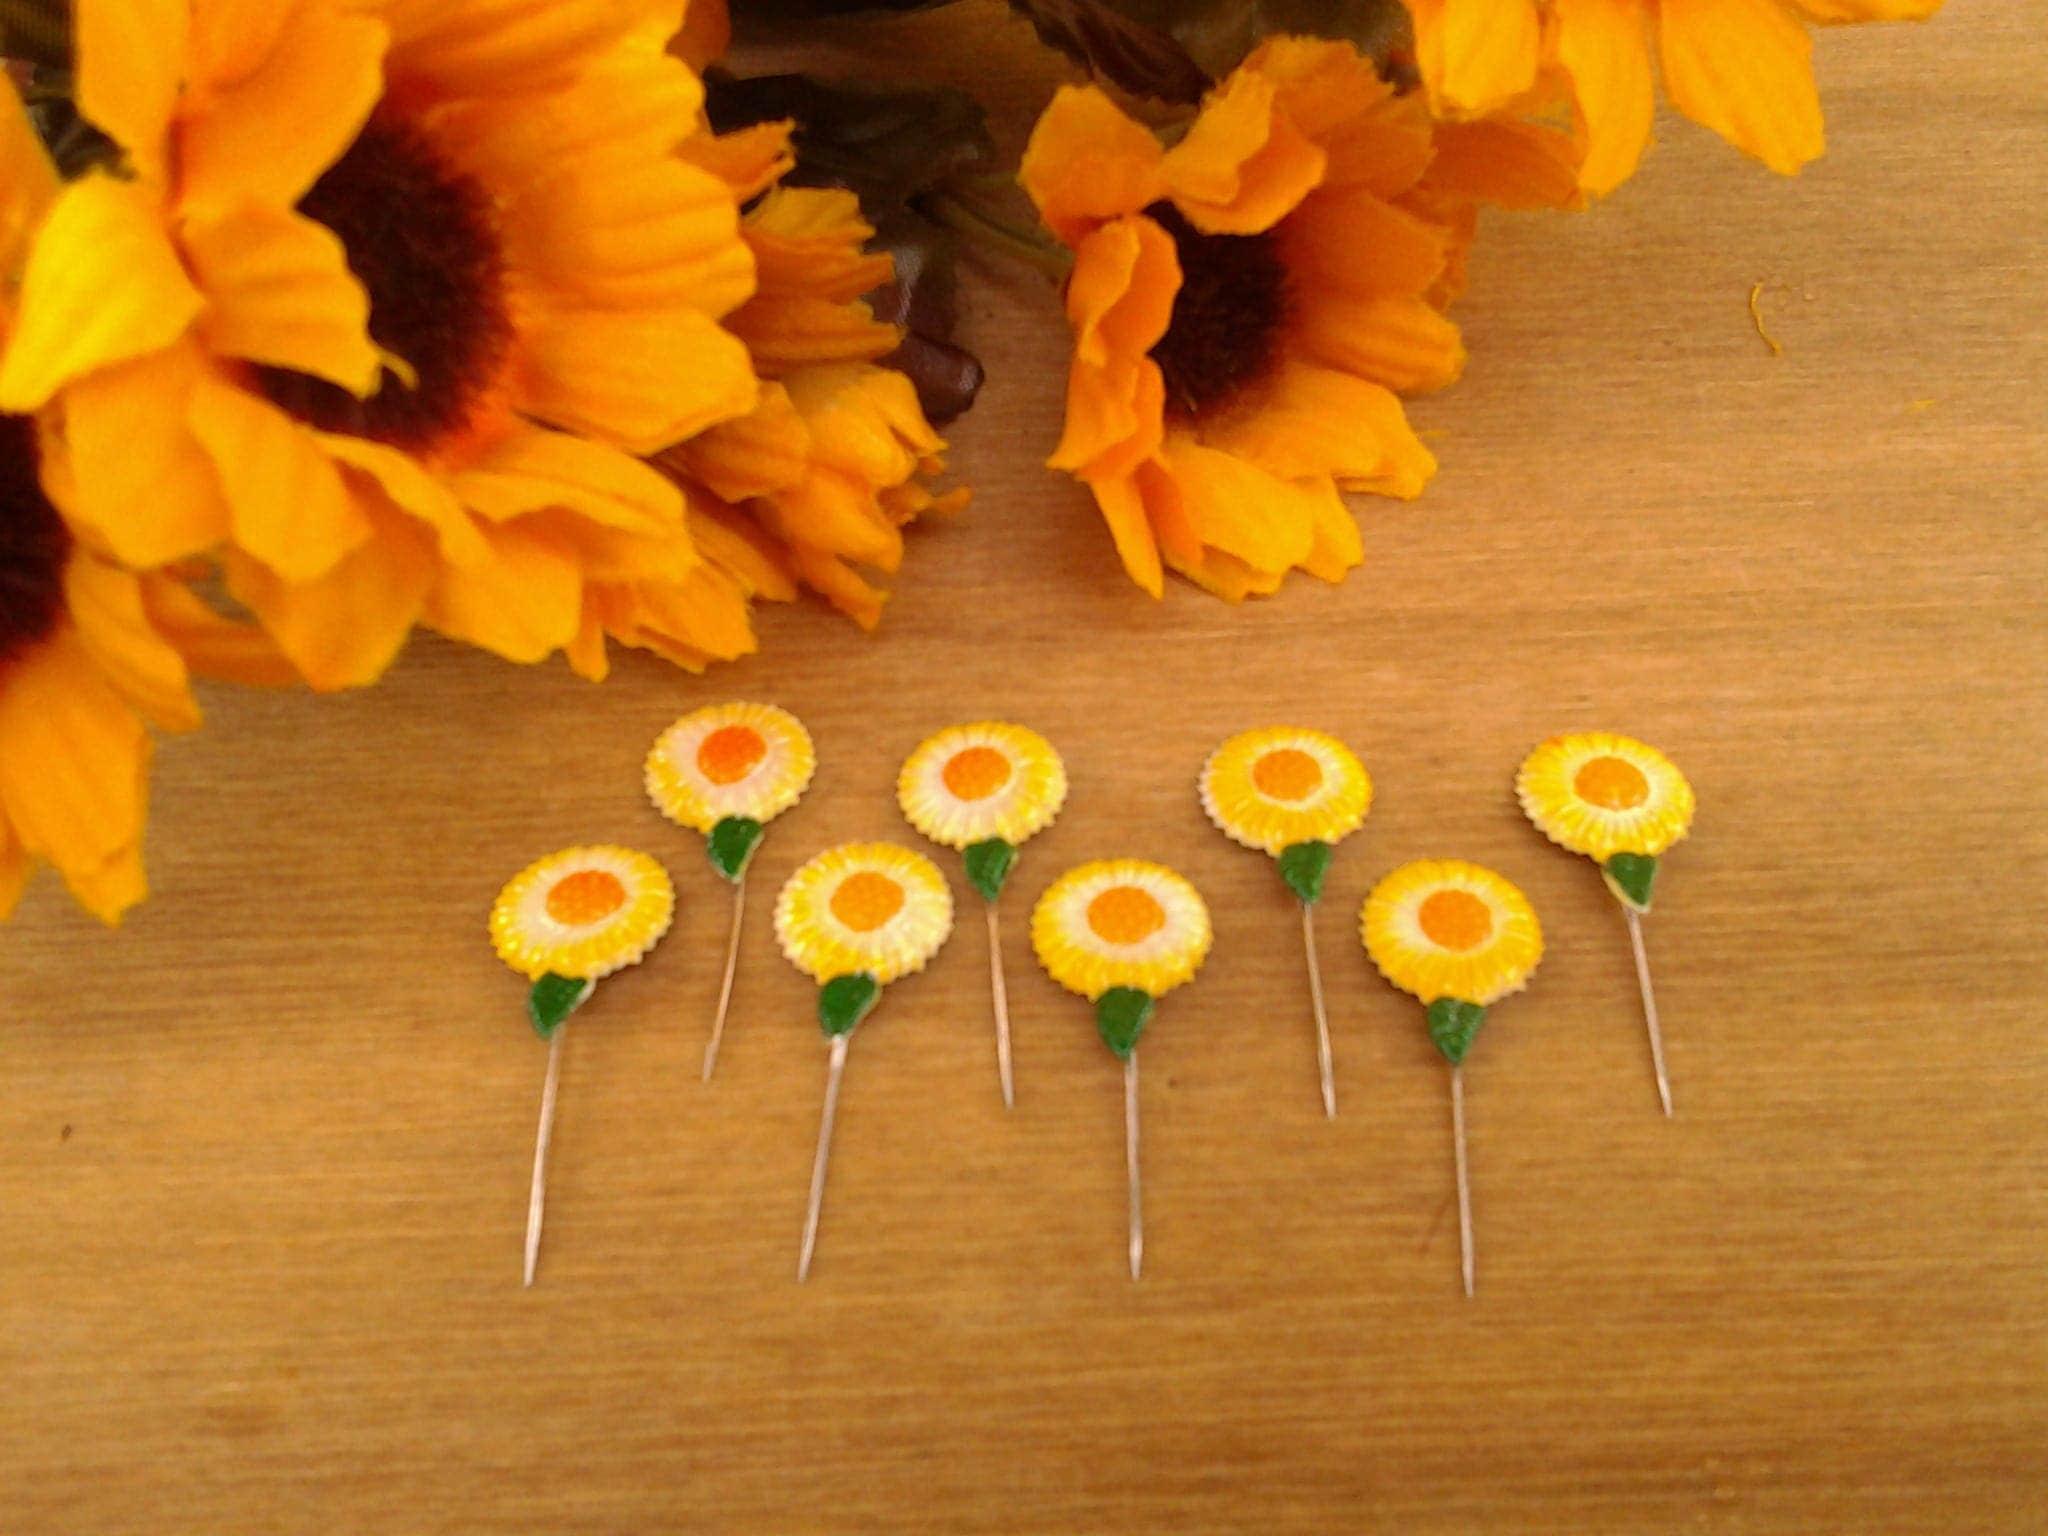 Stick pins for crafts - Stick Pins For Crafts 57